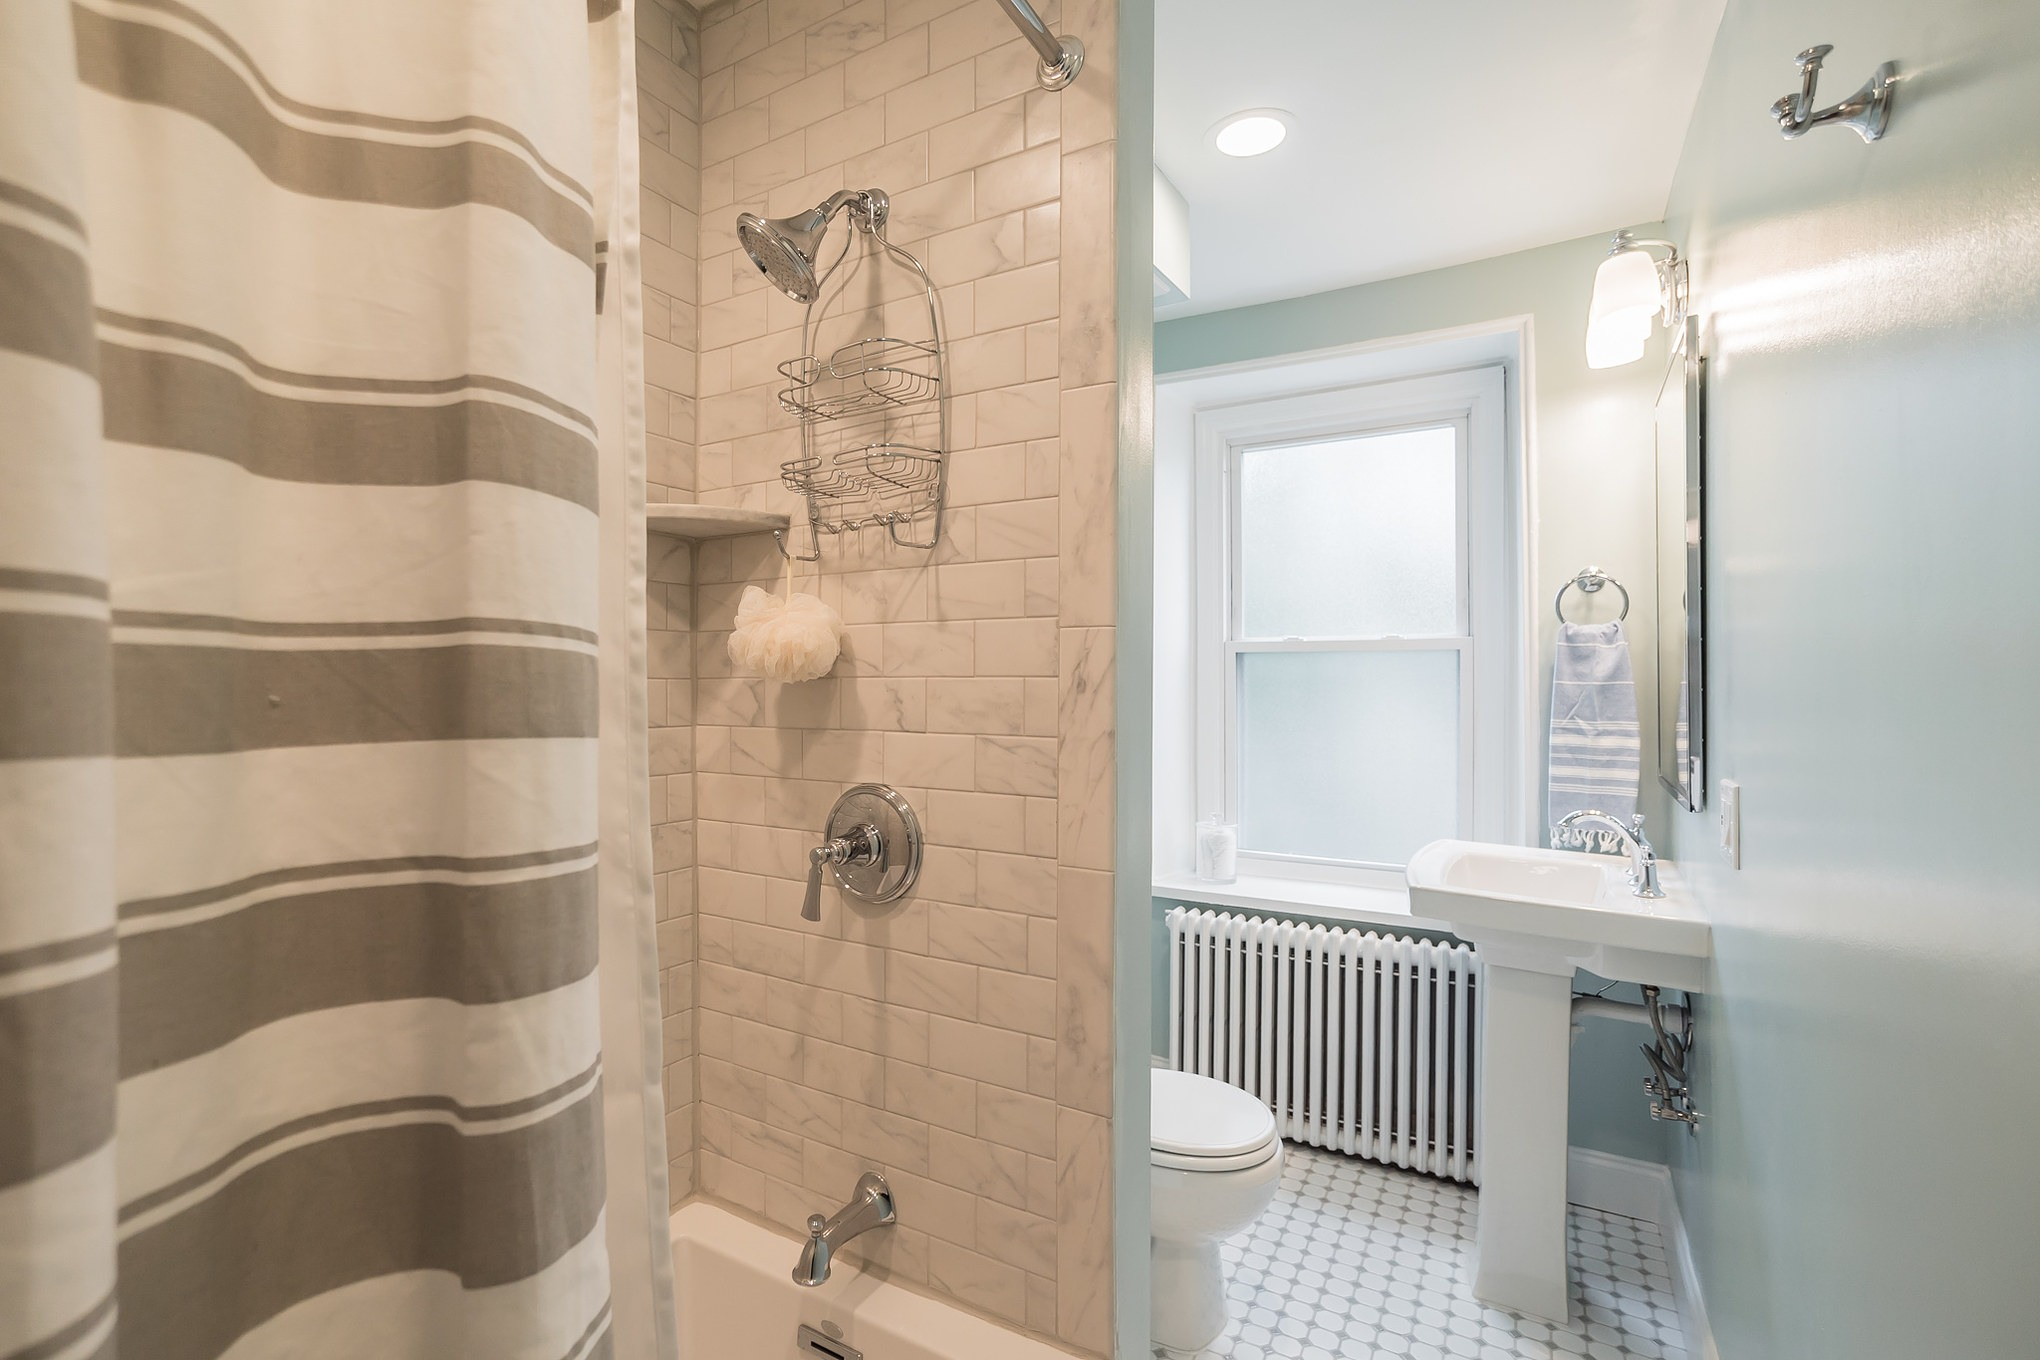 Awesome Gay Bathroom Interior